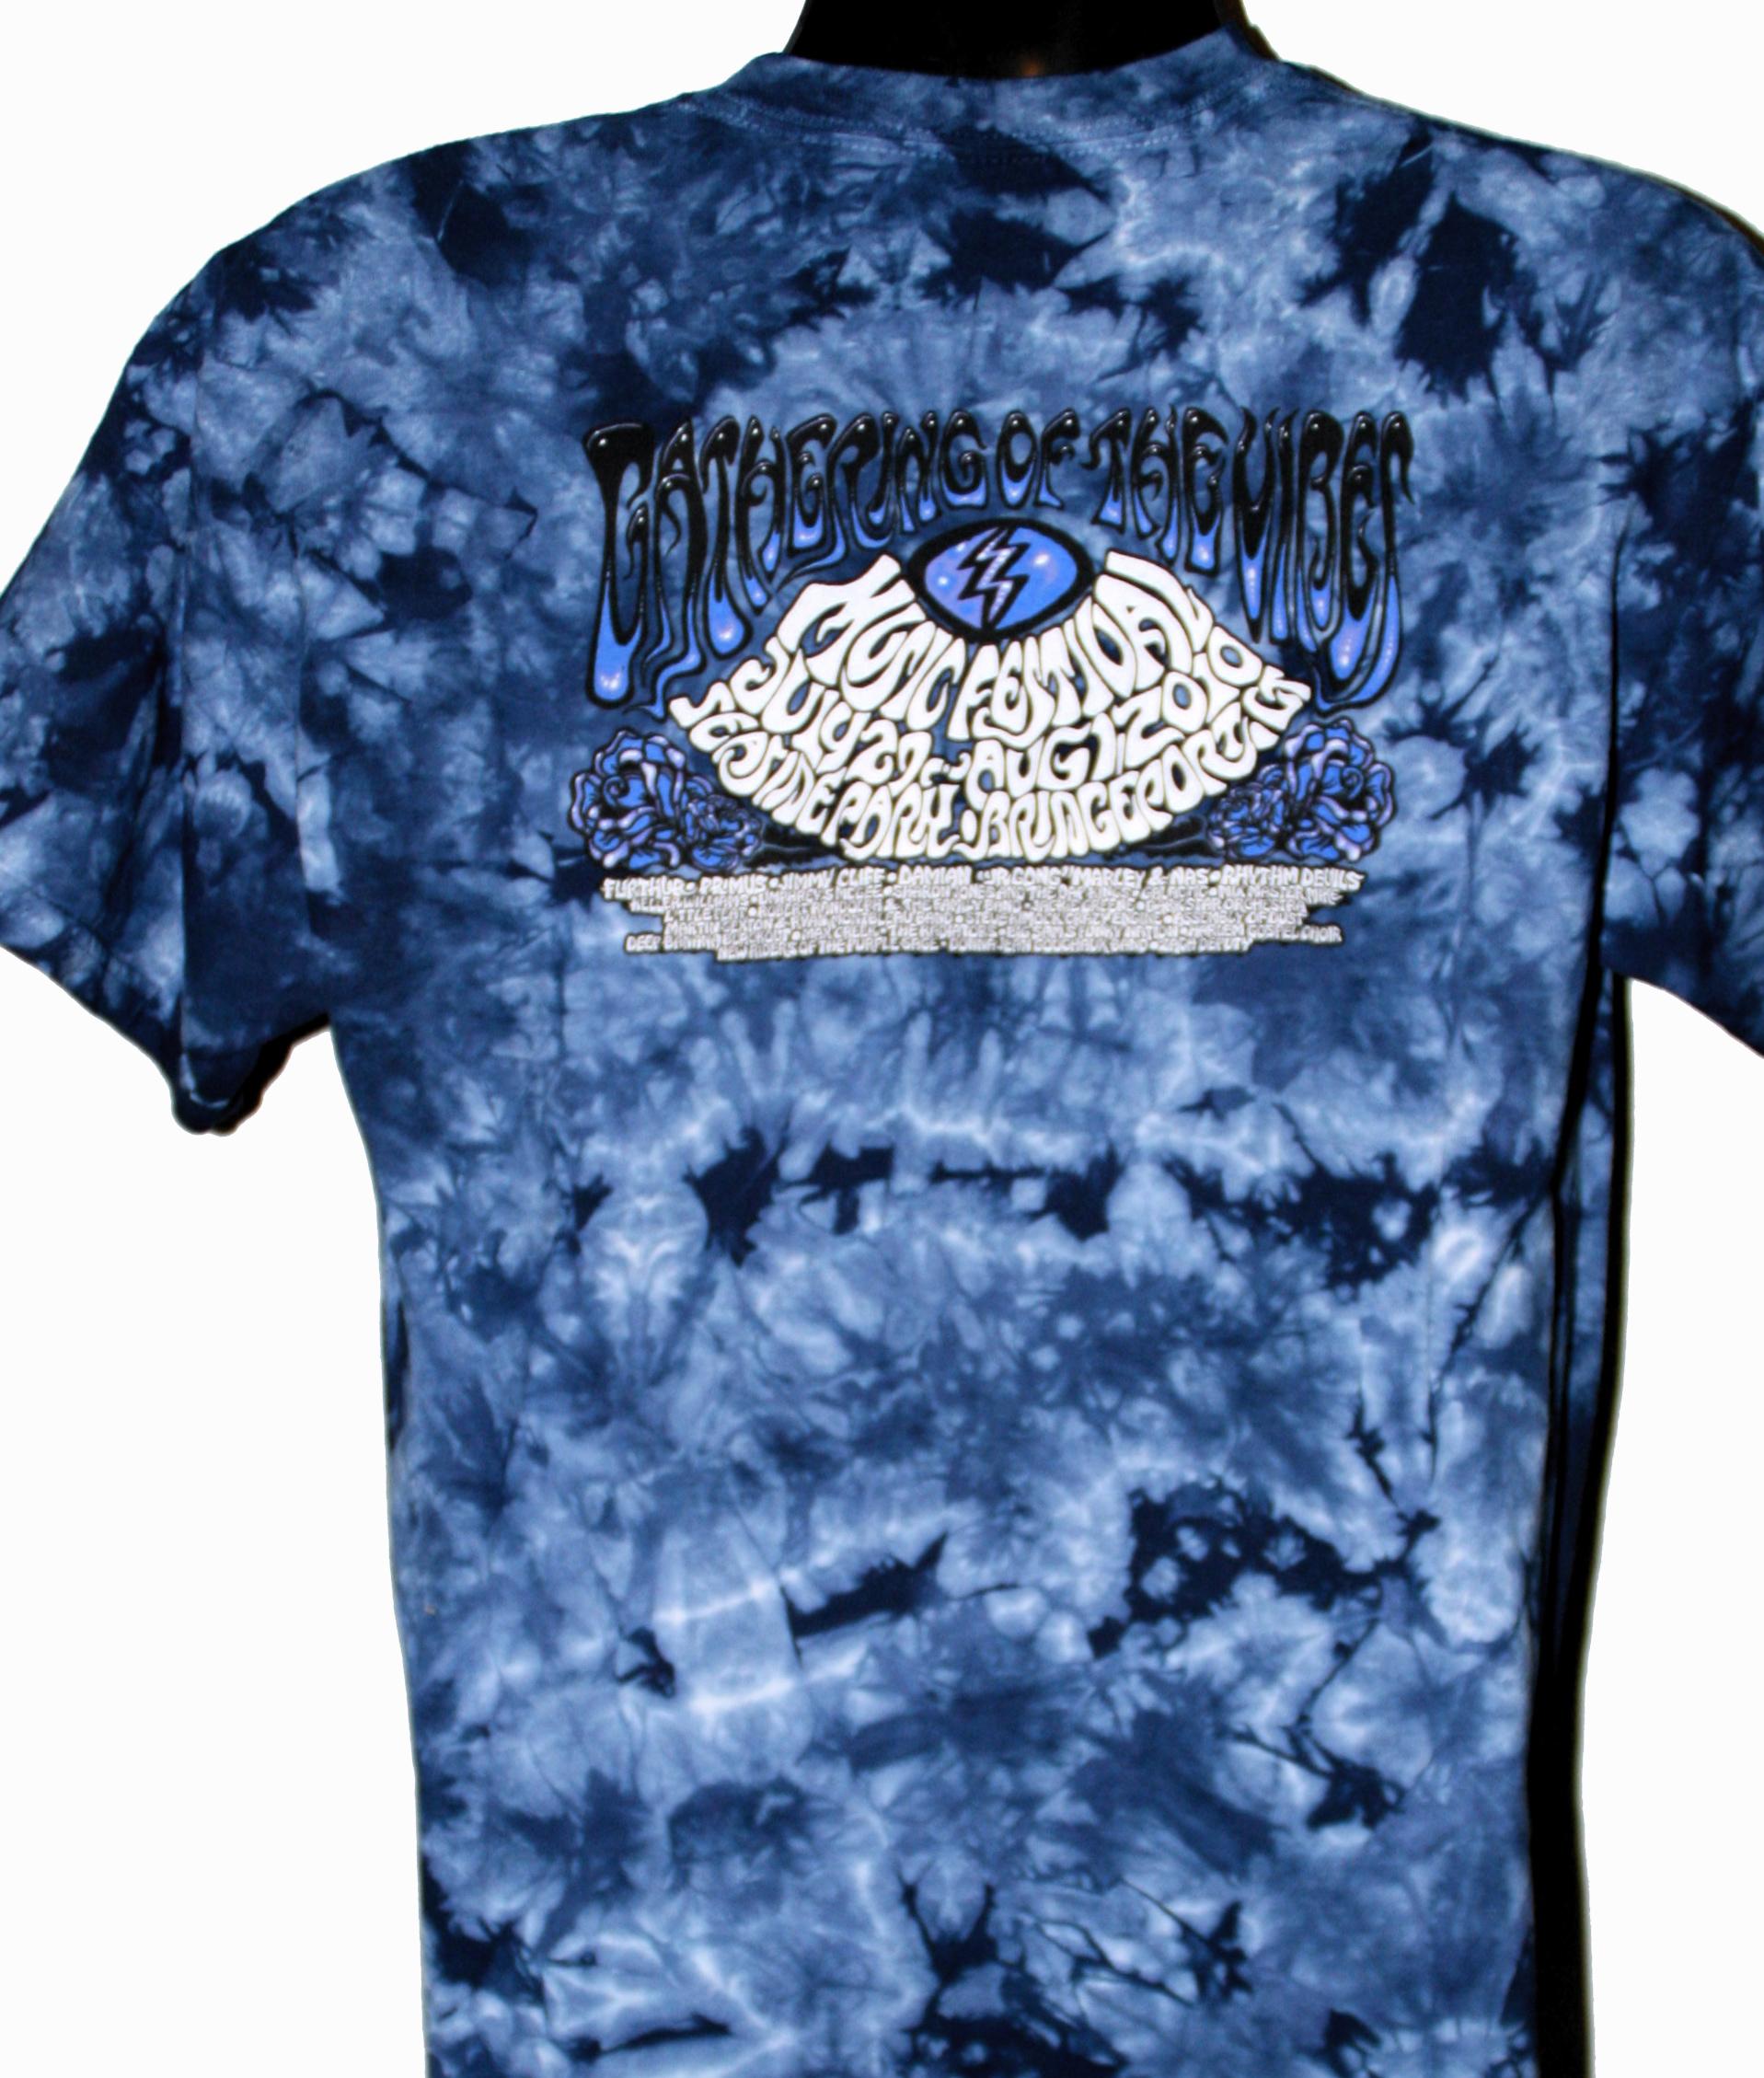 2010 Wood Turtle Dark Blue Tie Dye T Shirt Gathering Of